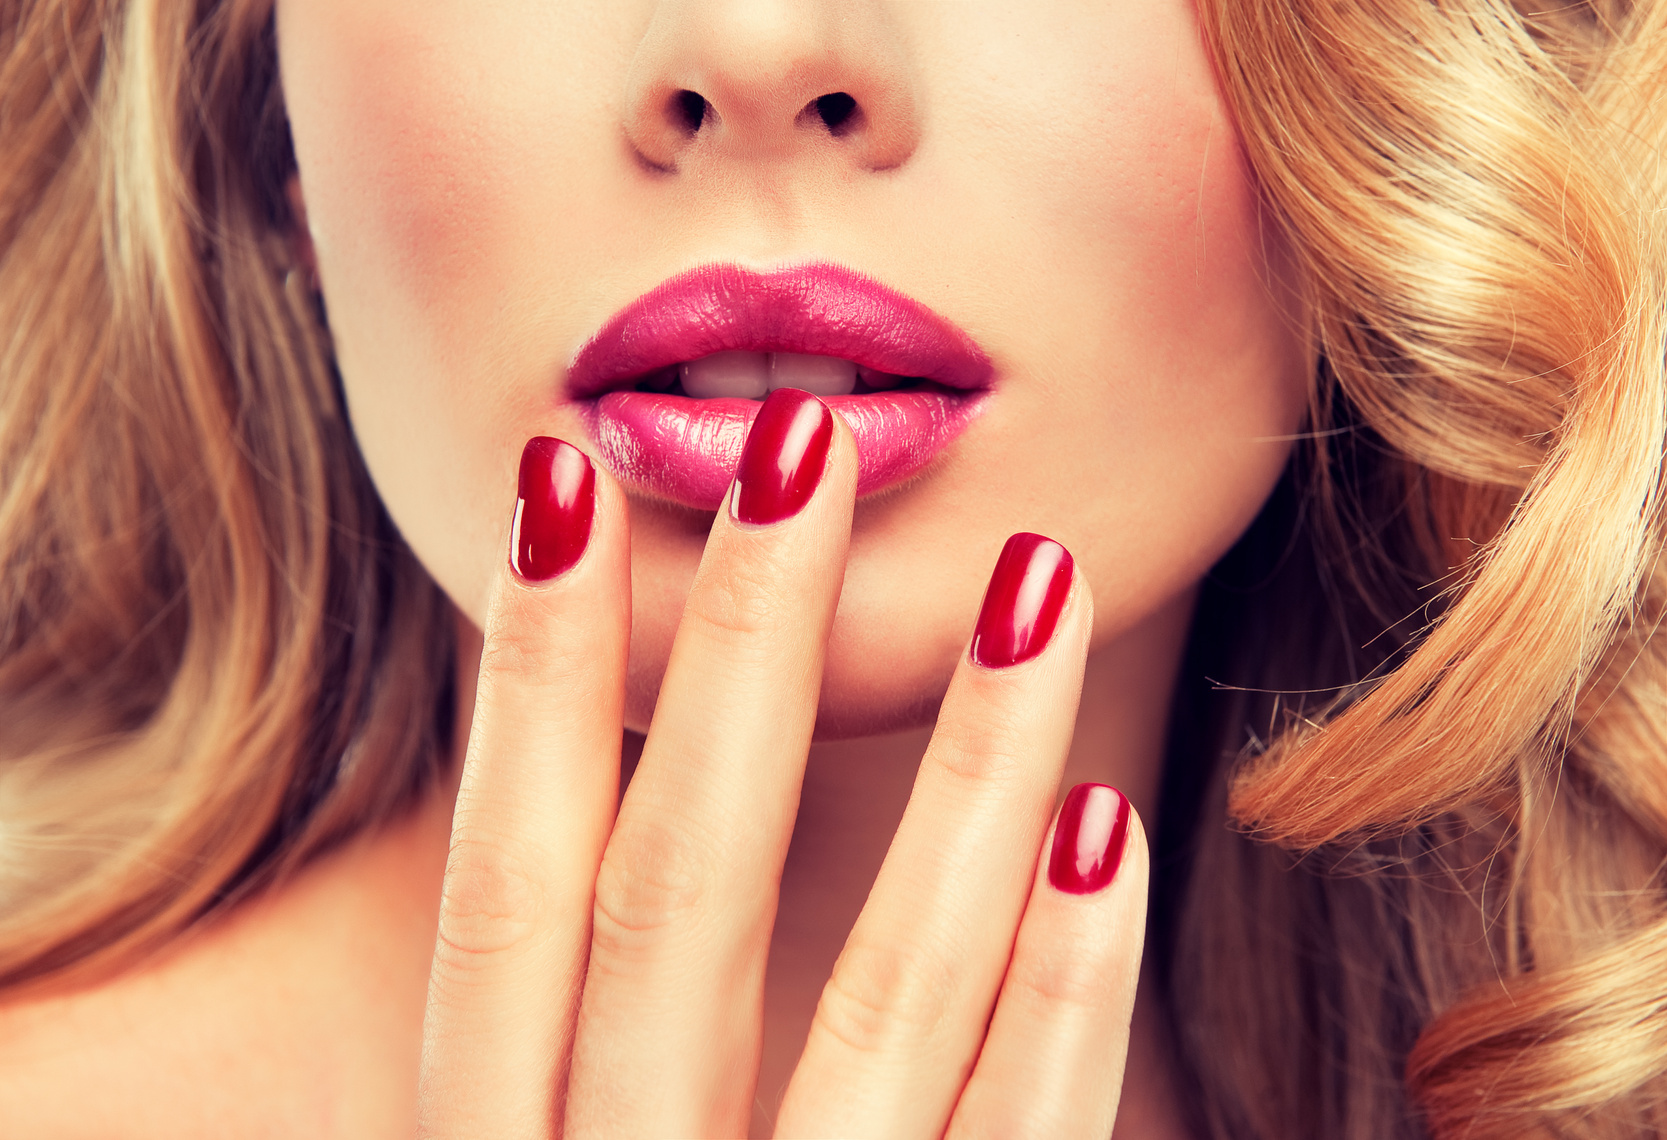 lippen richtig schminken anleitung. Black Bedroom Furniture Sets. Home Design Ideas